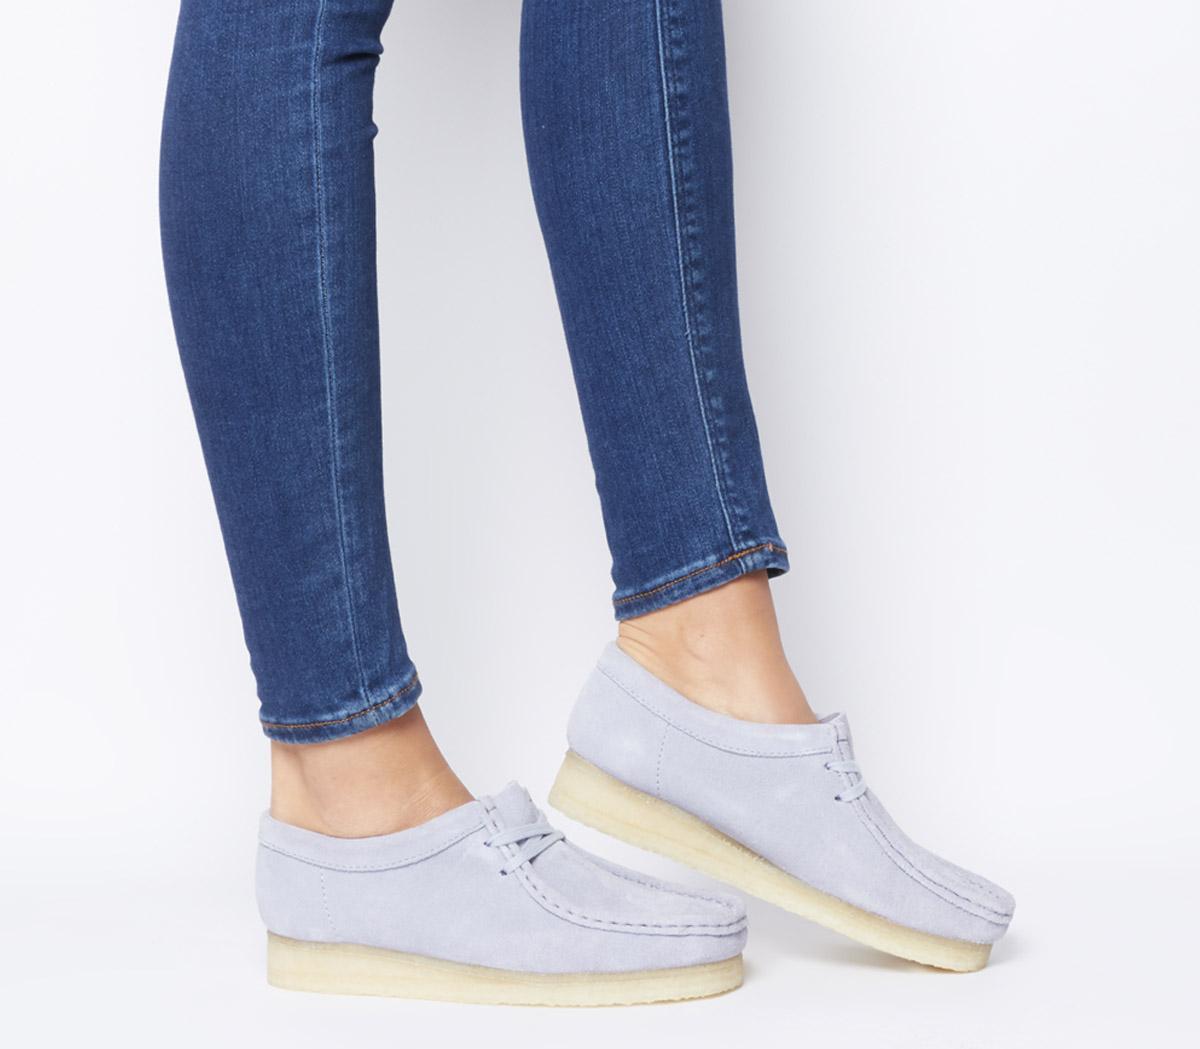 Clarks Originals Wallabee Shoes Cool